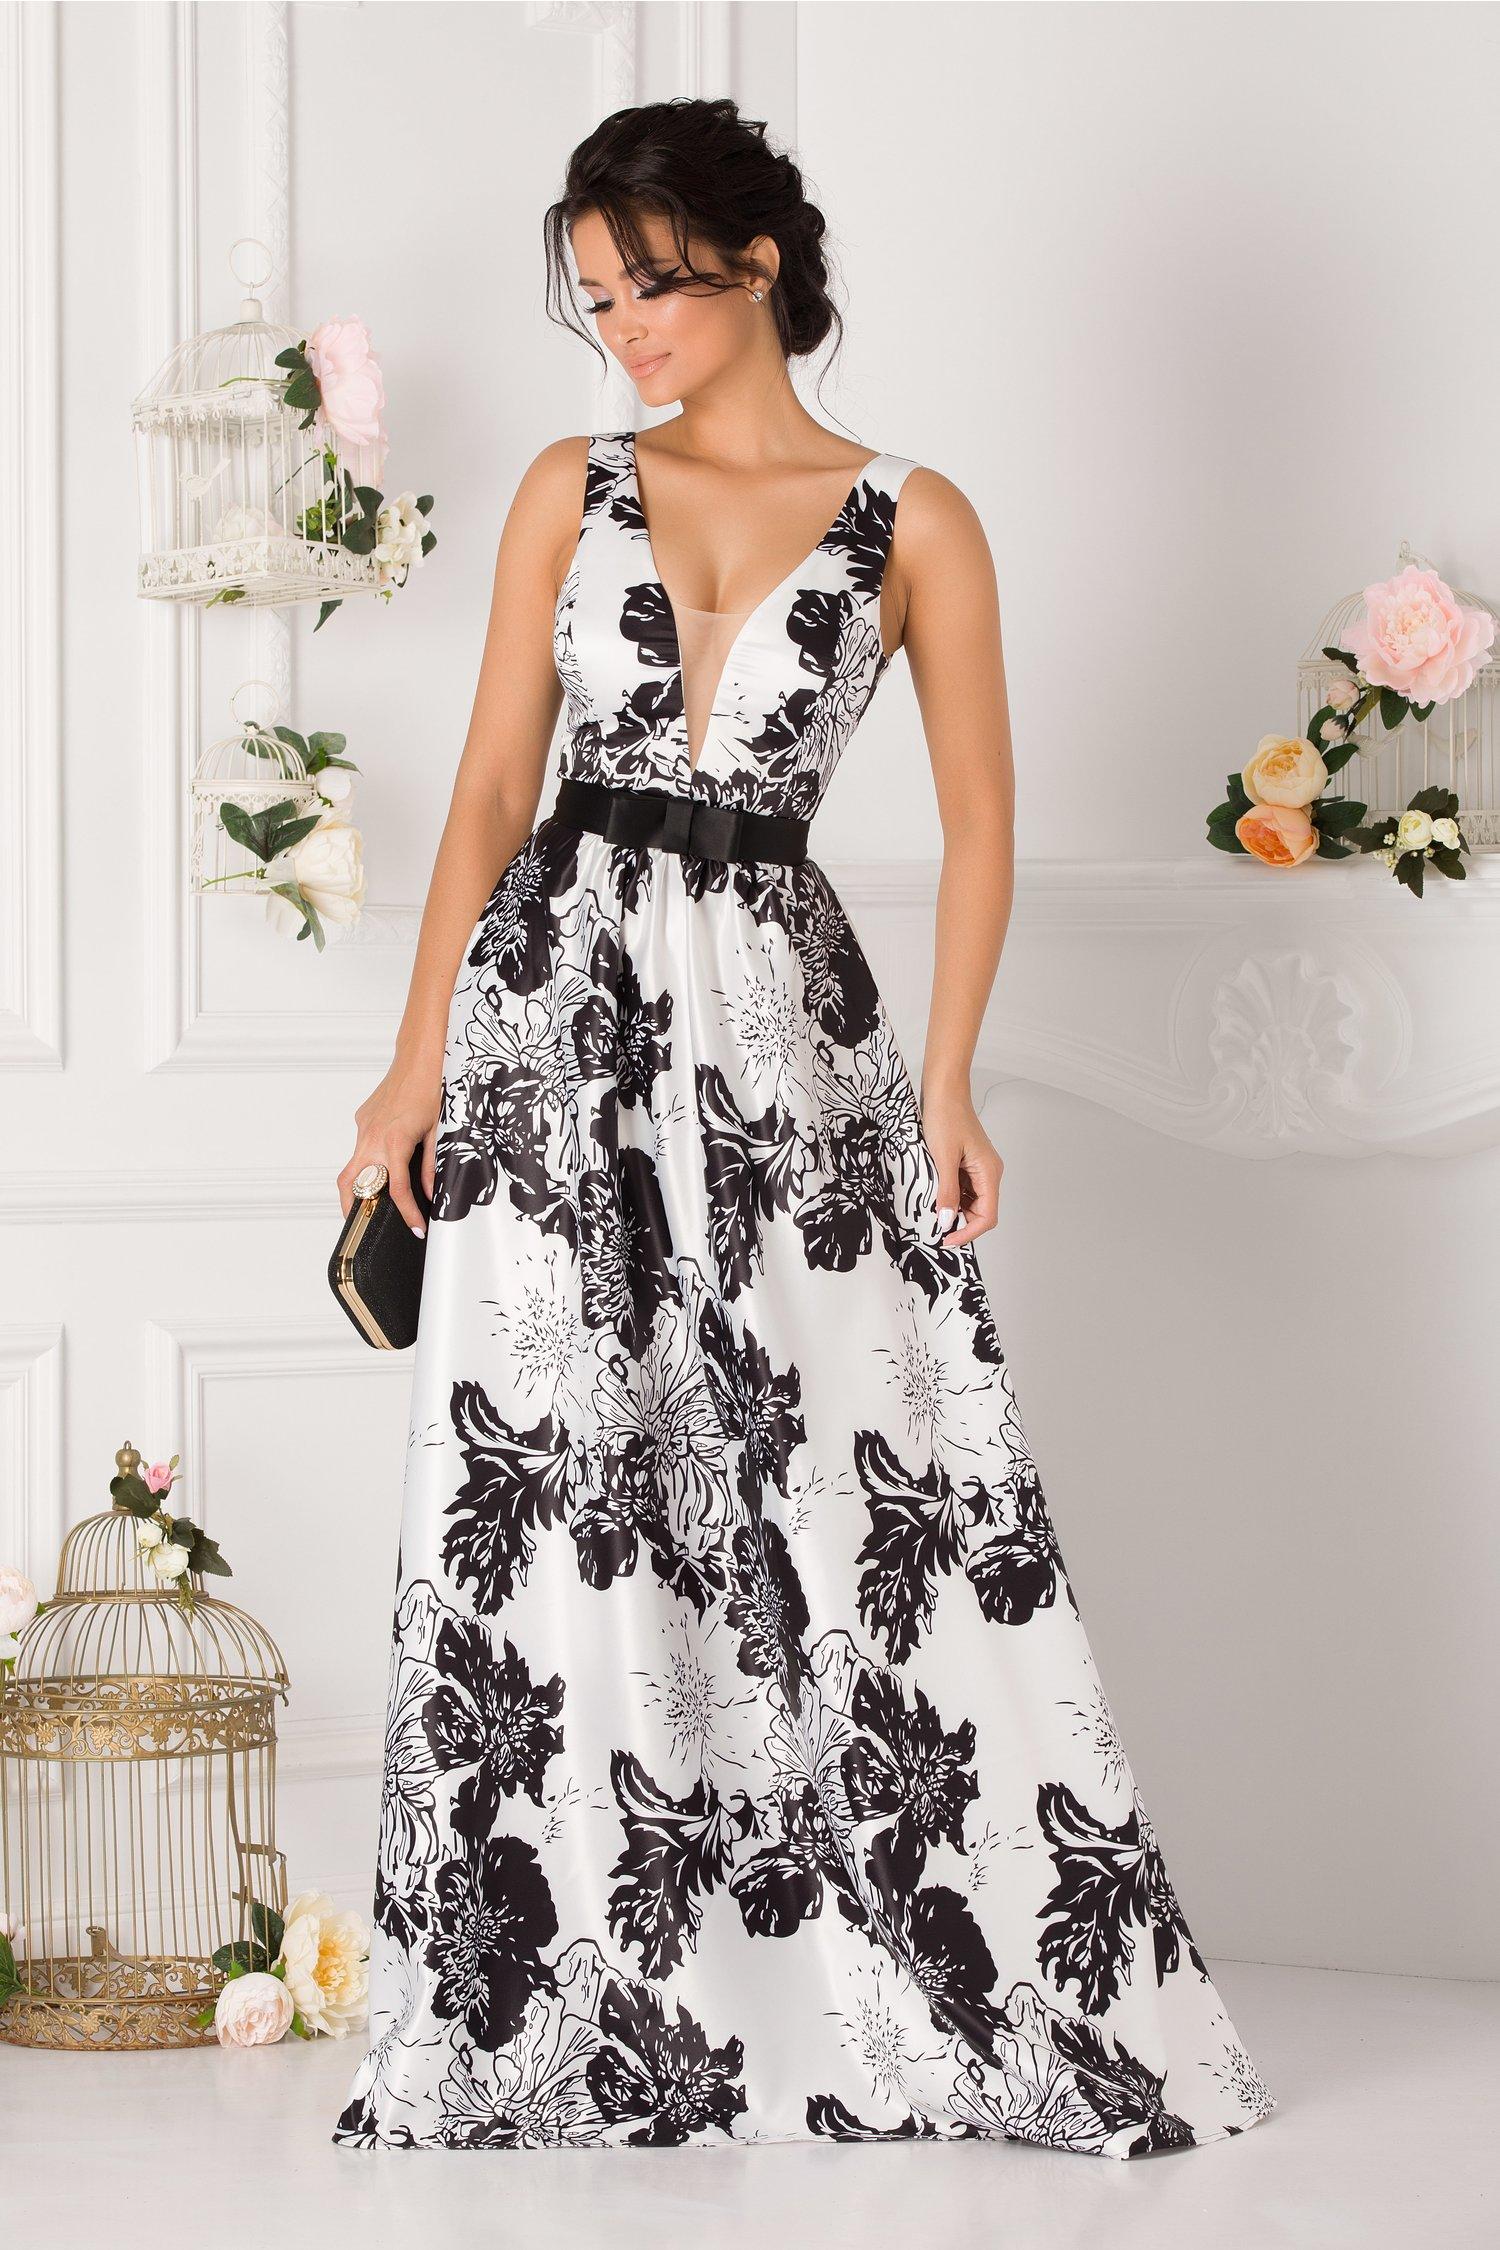 Rochie Artista alba cu imprimeuri florale negre